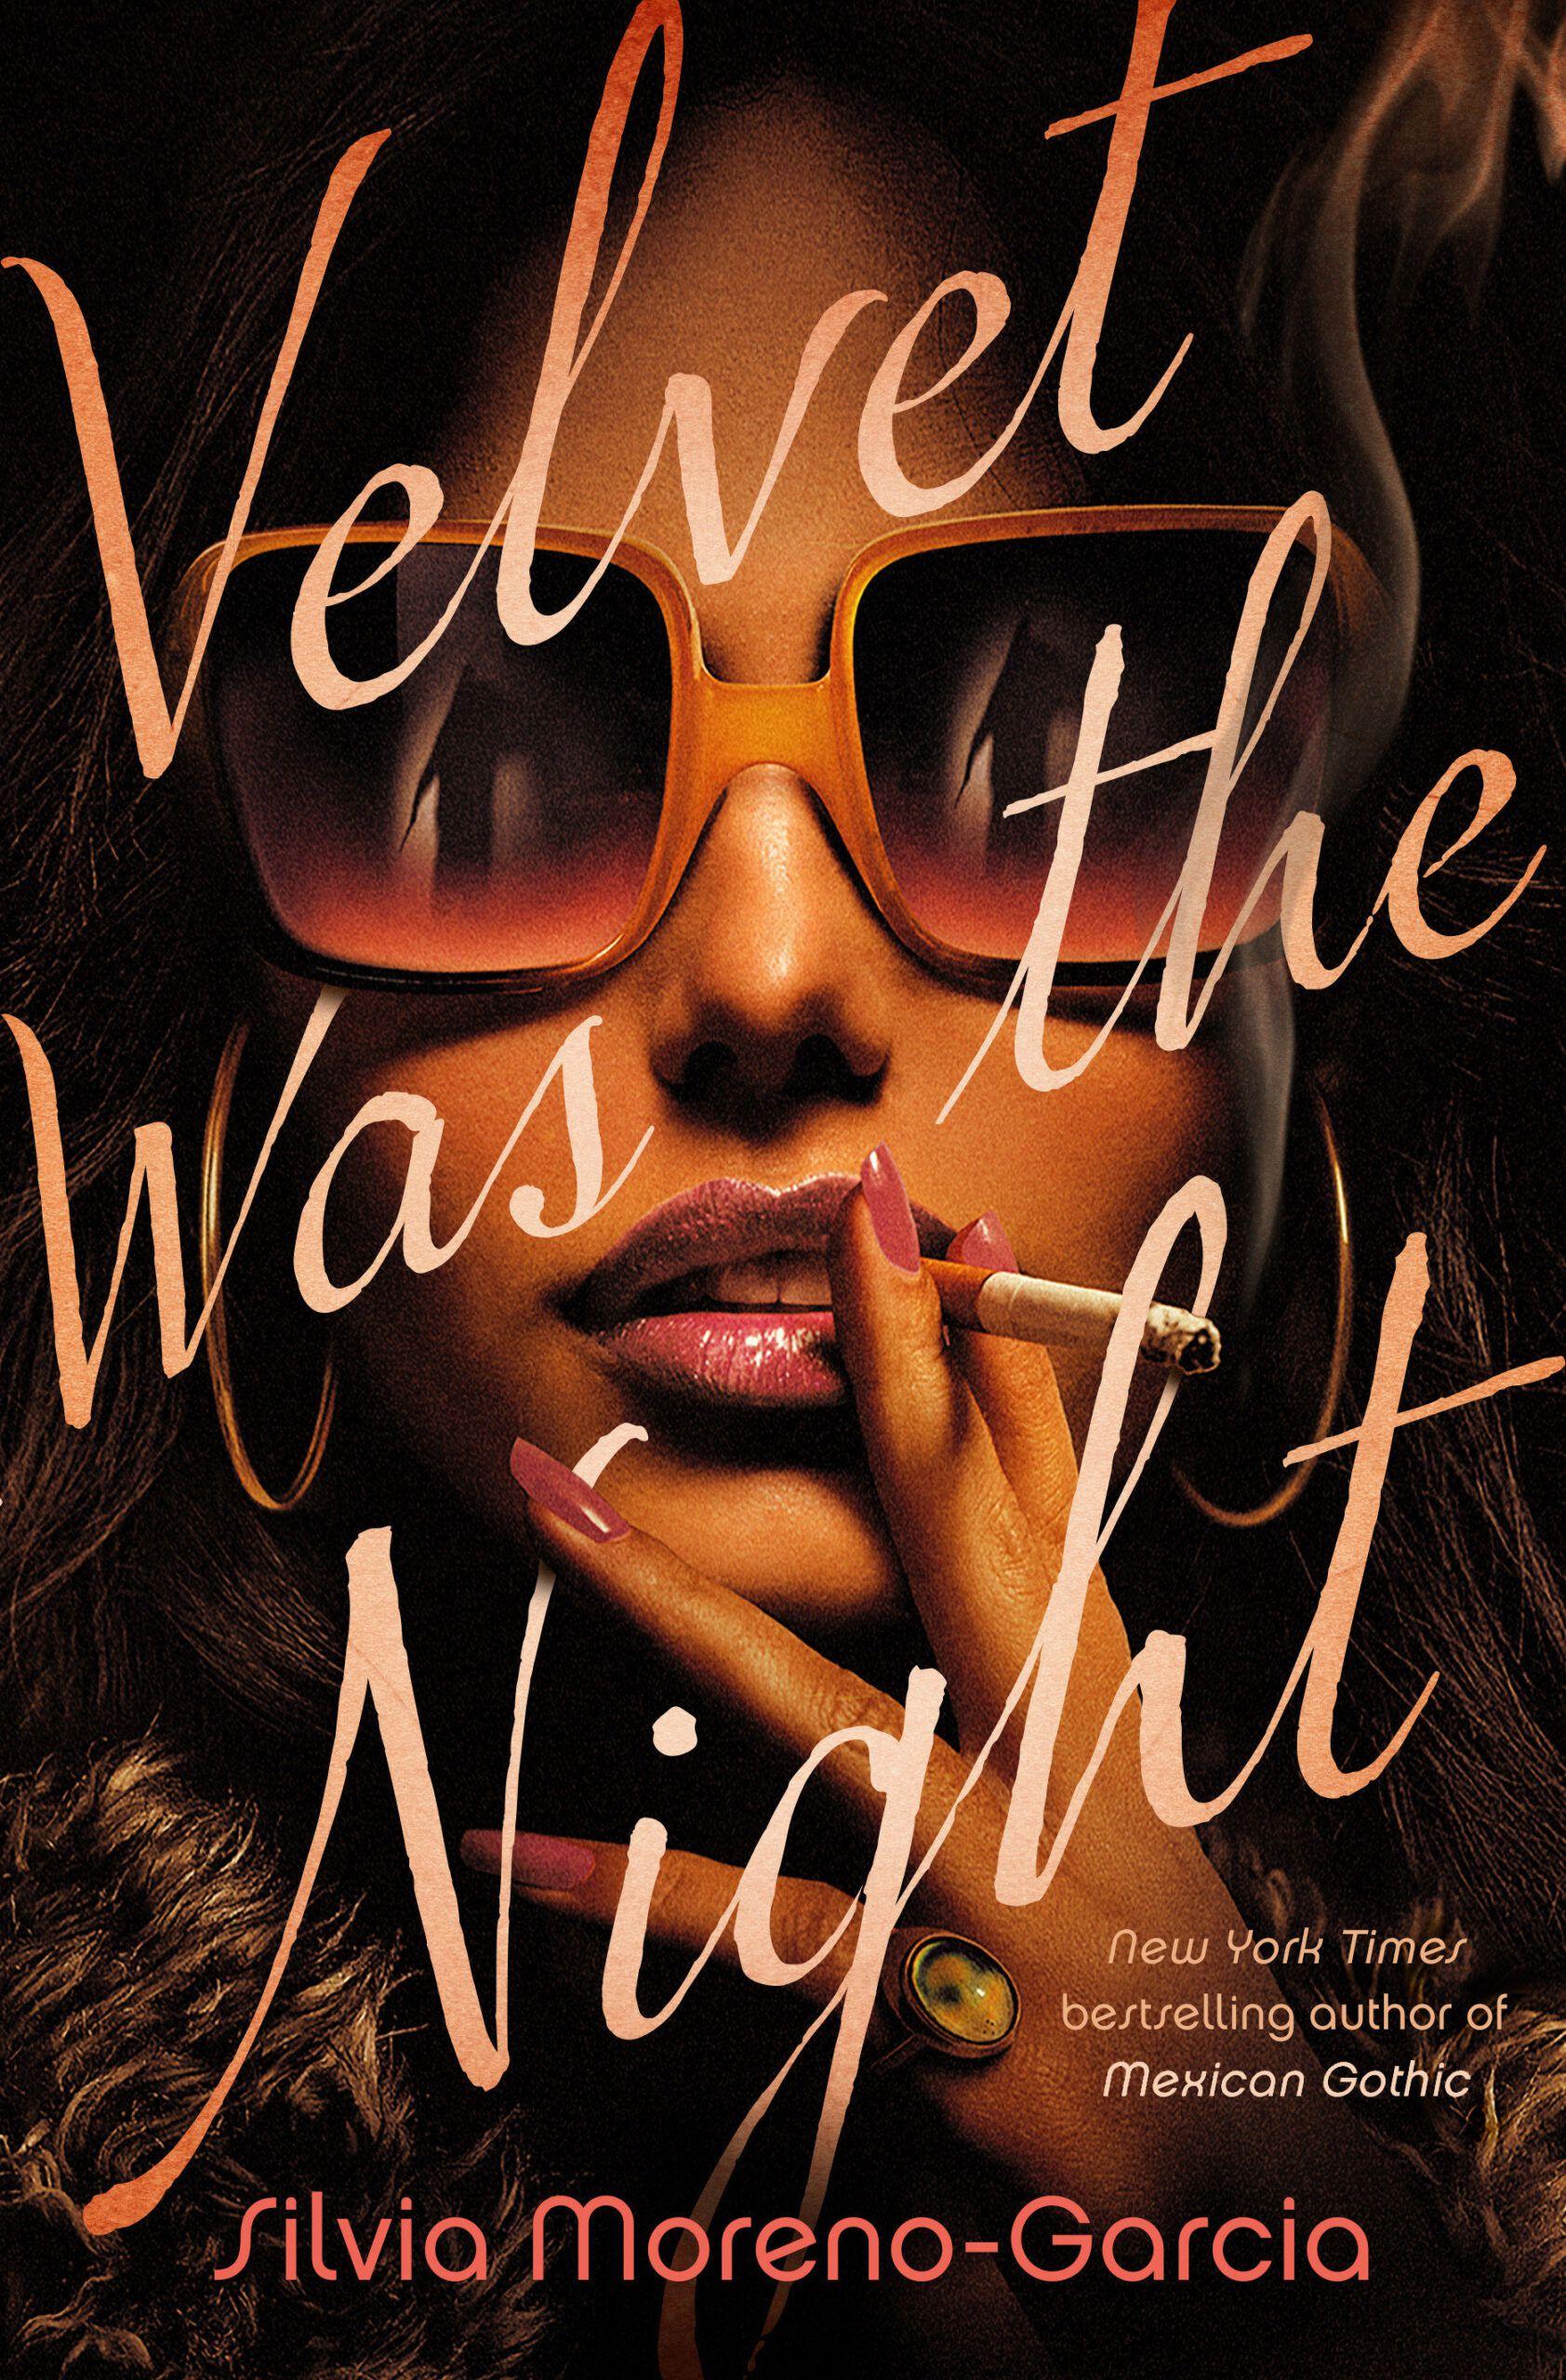 Velvet was the Night by Silvia MorenoGarcia